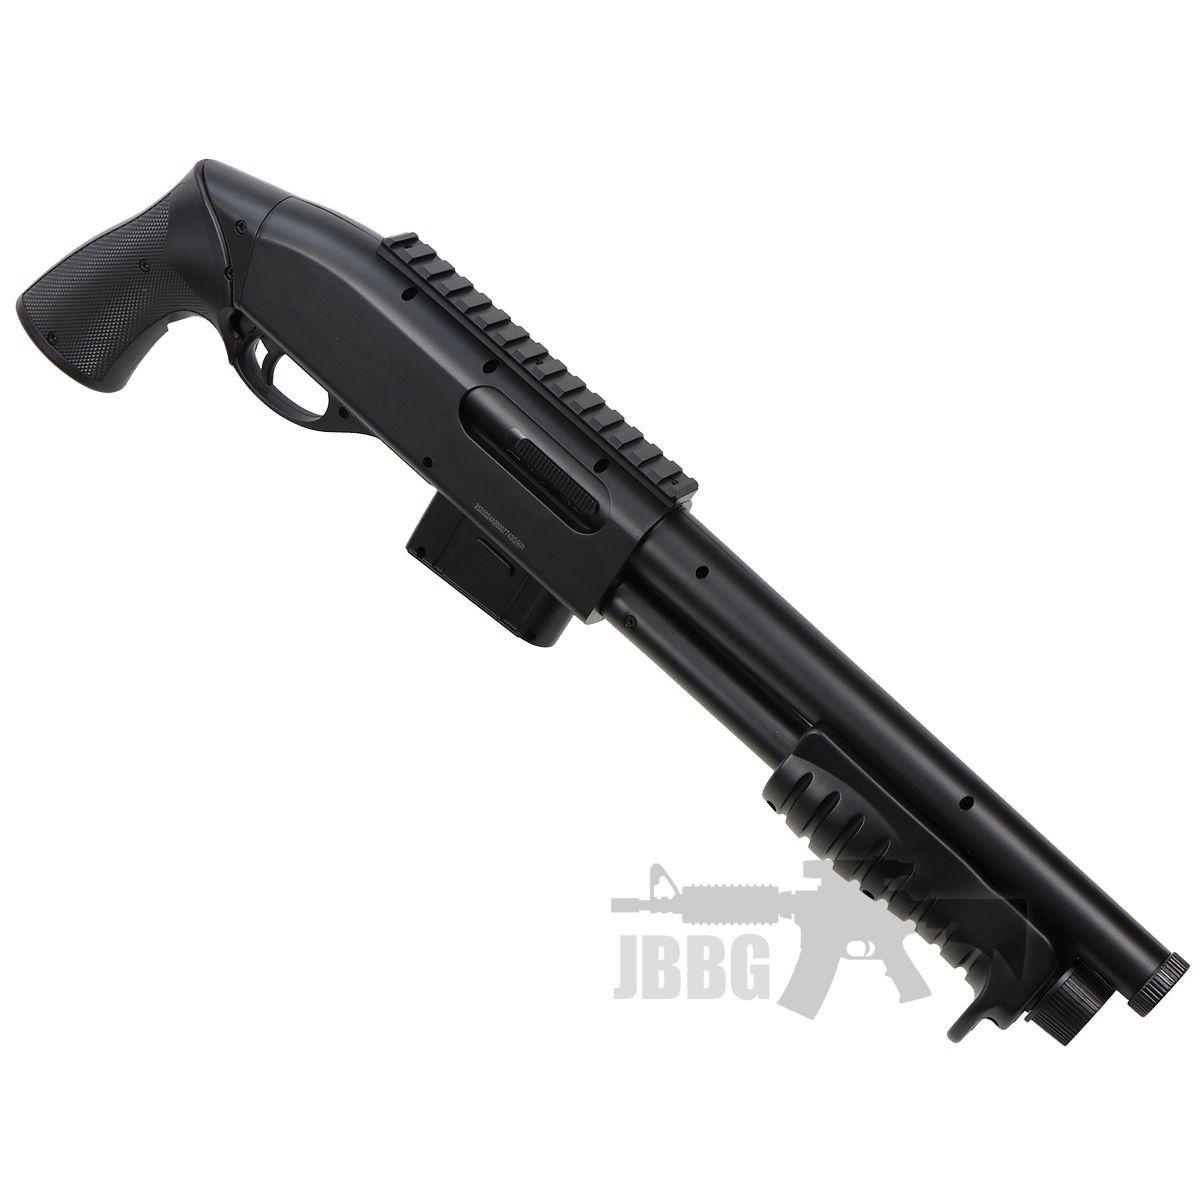 shotgun airsoft jbbg 1